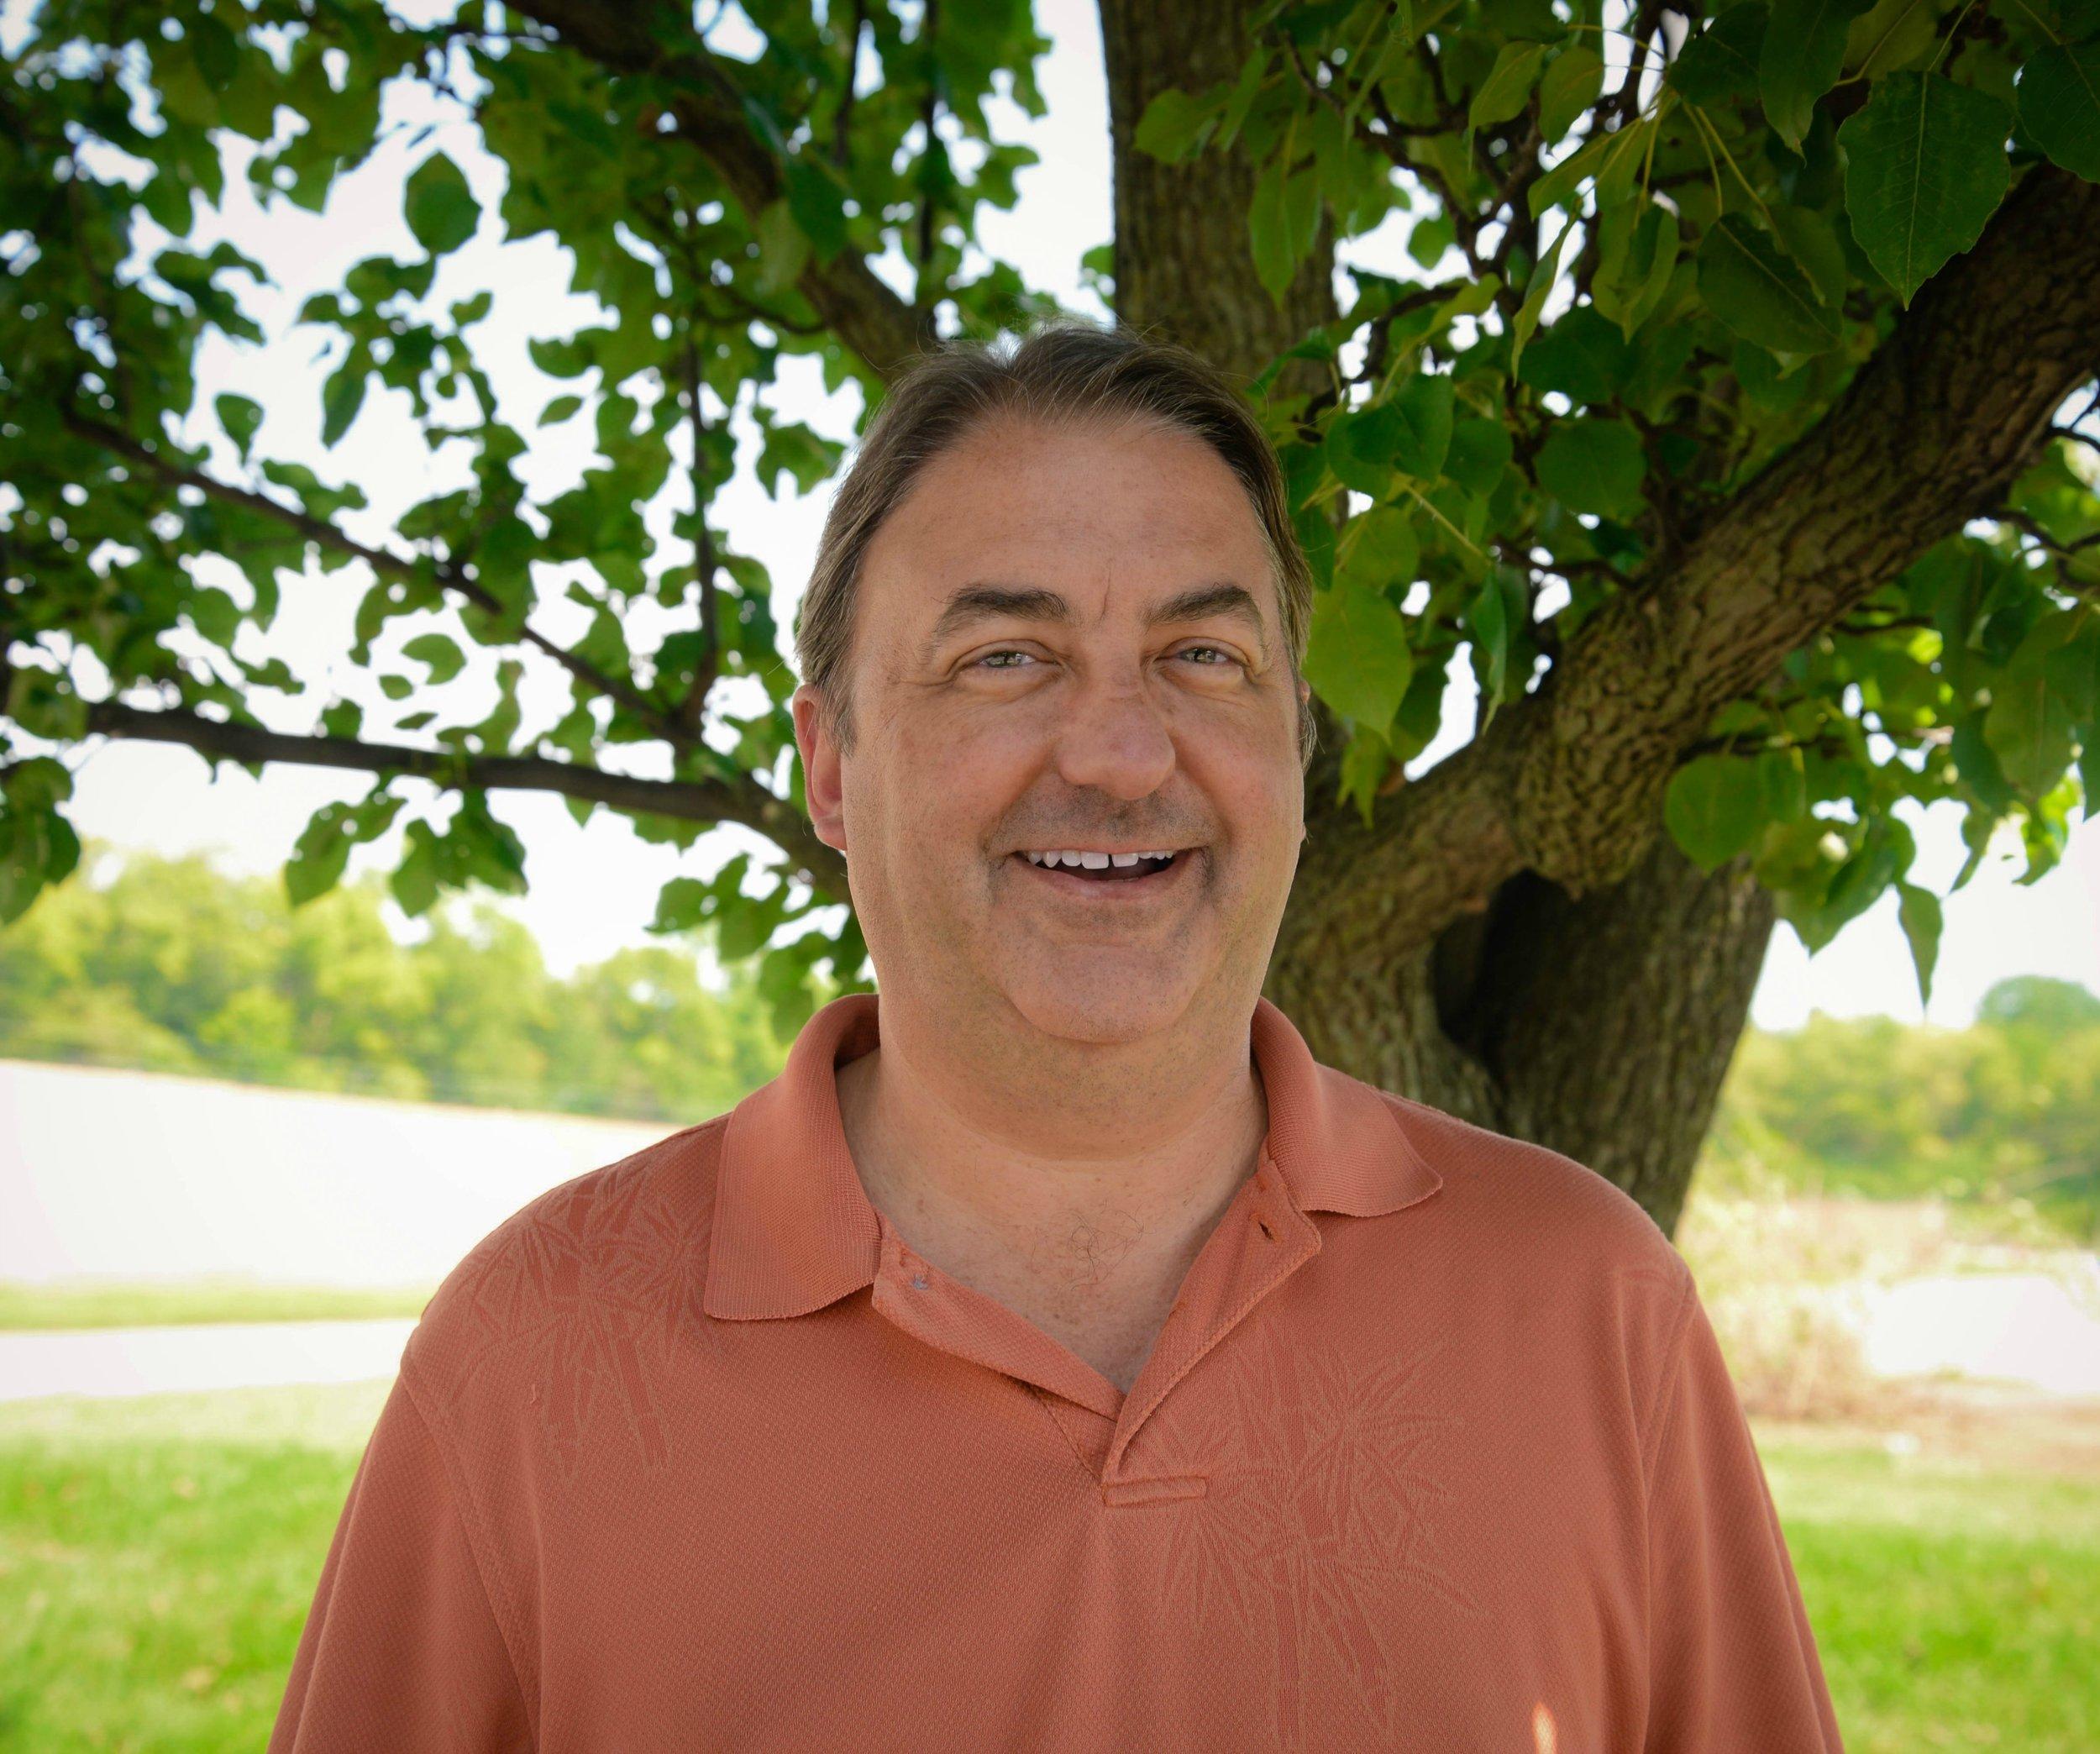 Doug F. Wagner, Operations Manager dwagner@moodysofdayton.com